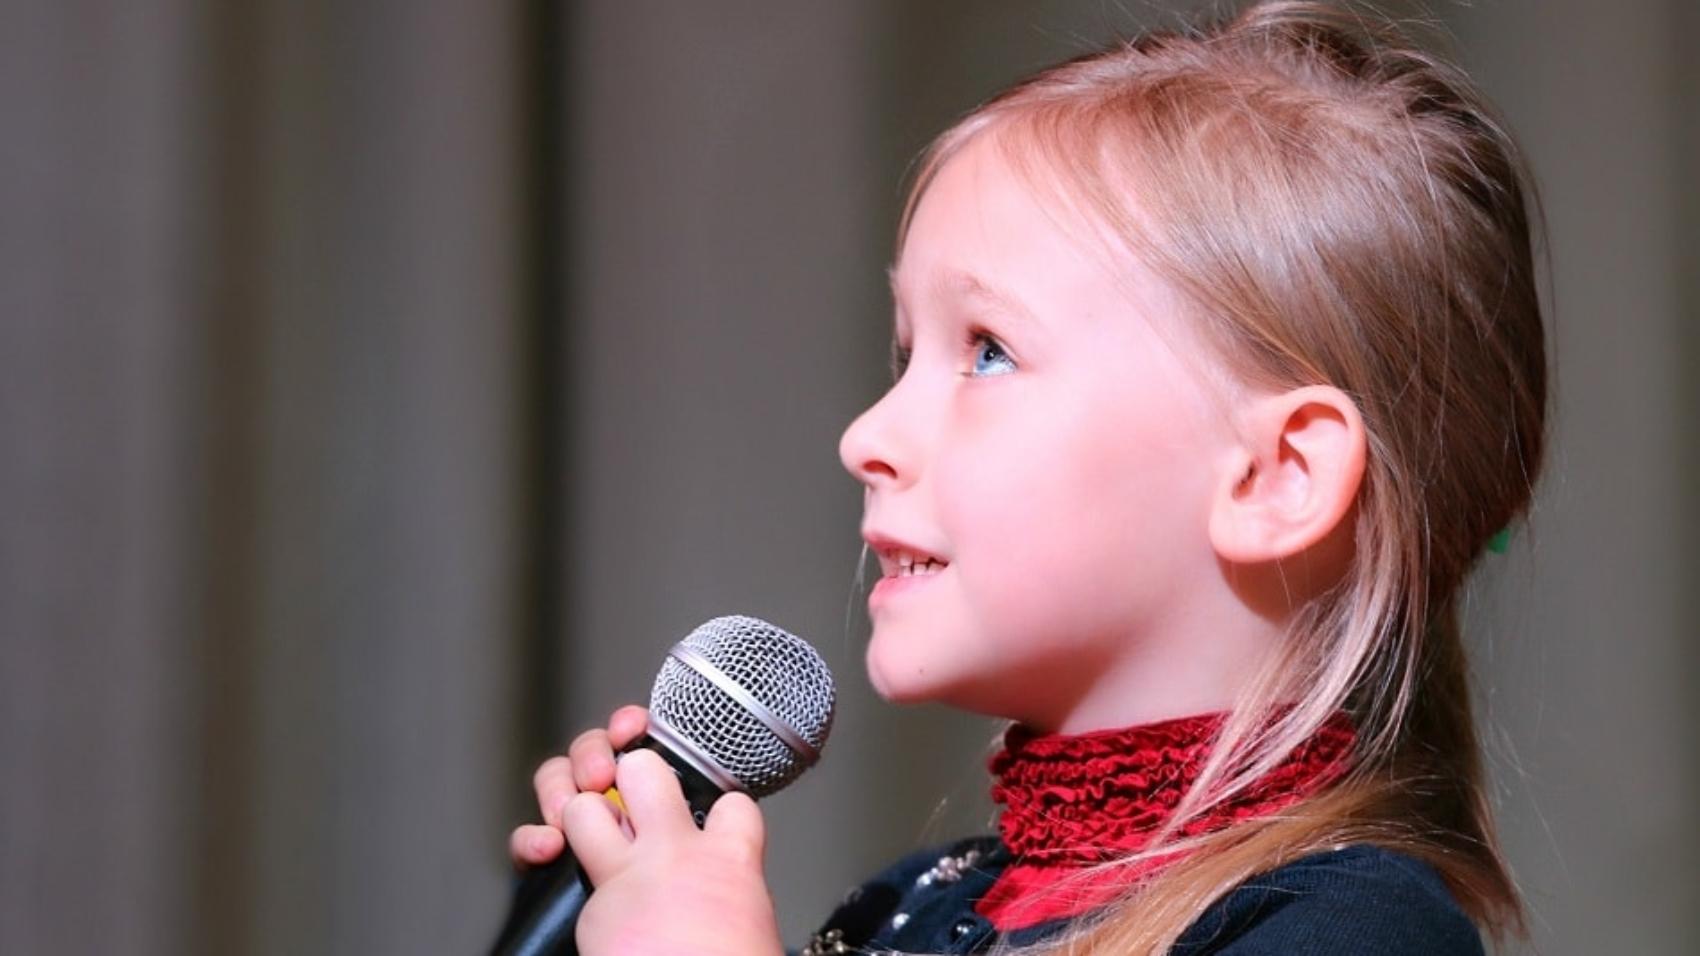 Be Mindful in Nurturing Natural Talents in Children